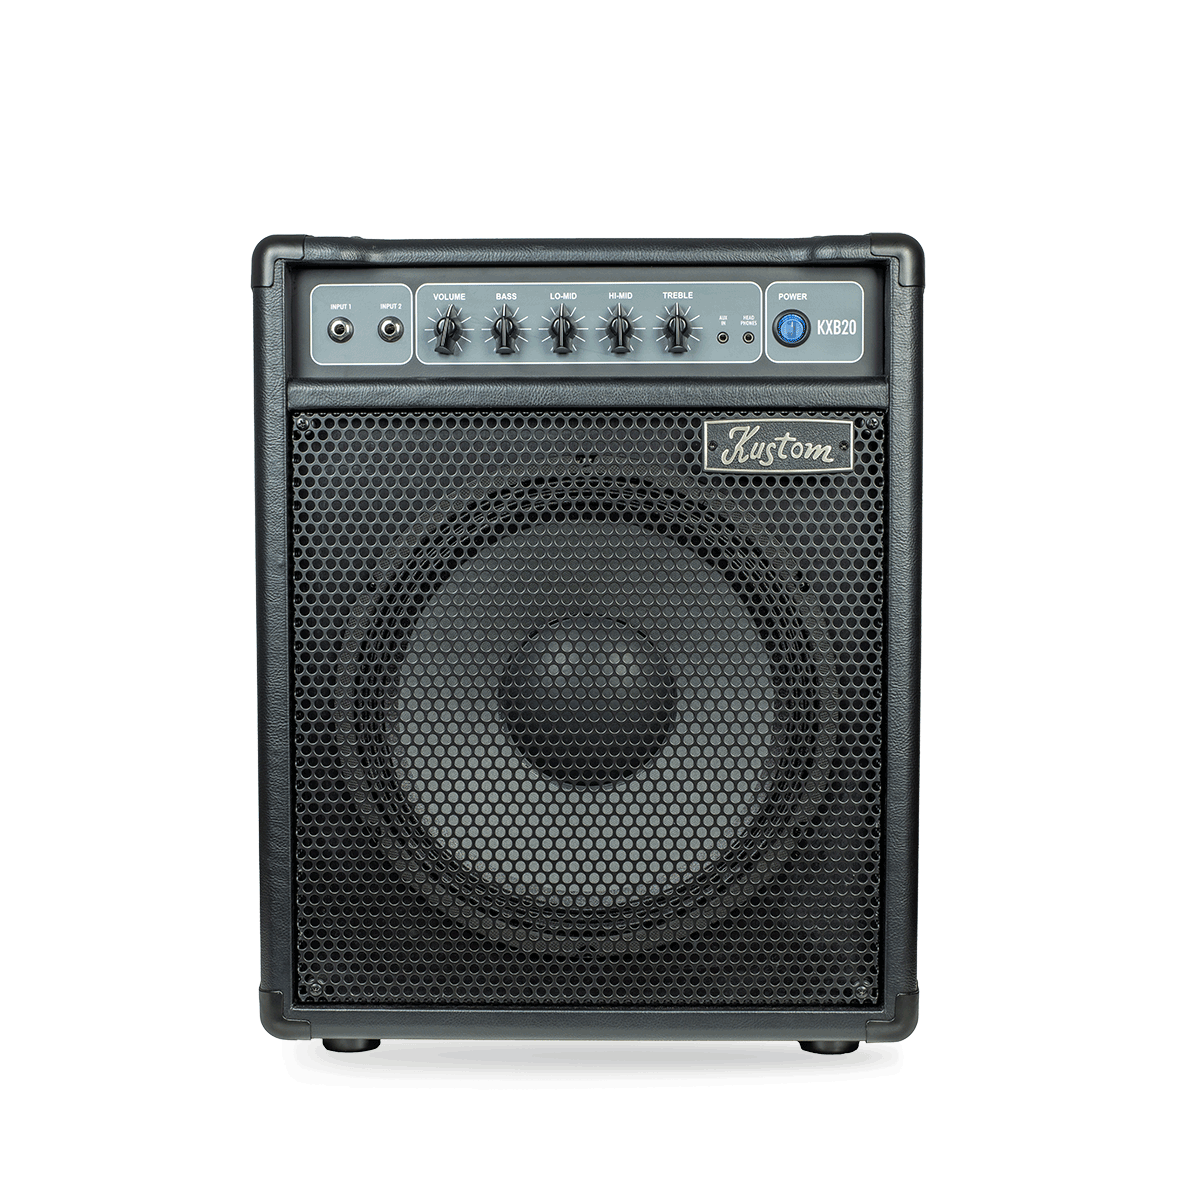 Kustom KXB20 20-Watt 1 x 12 Bass Combo w/ 4-band EQ Aux In and Headphone Out